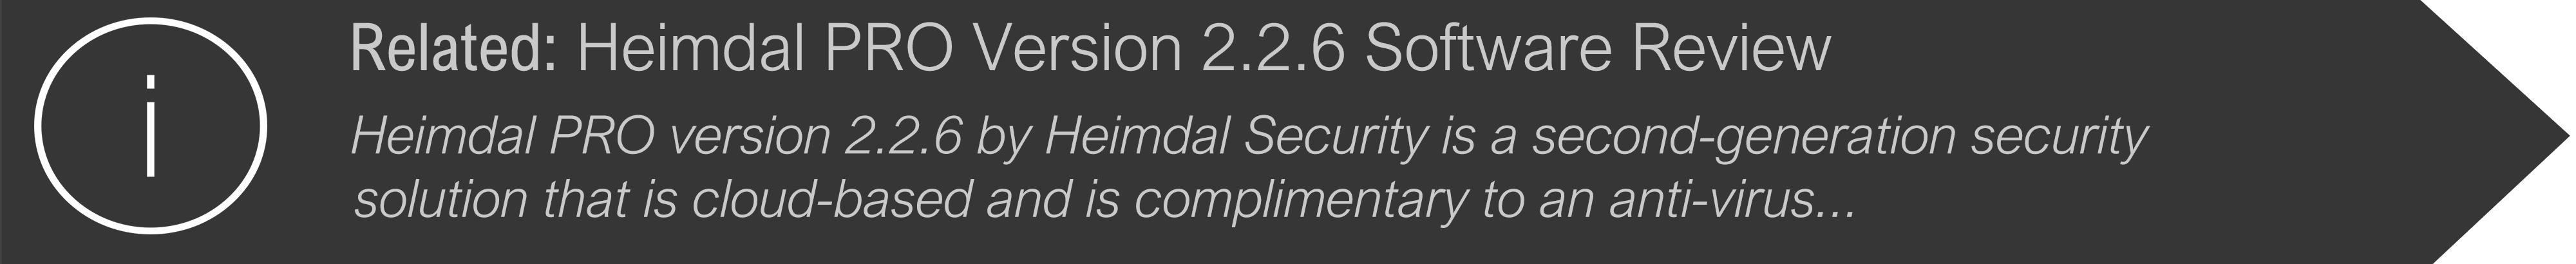 relacionada con la heimdal-pro-software-review-open-js-archivos-sensorstechforum